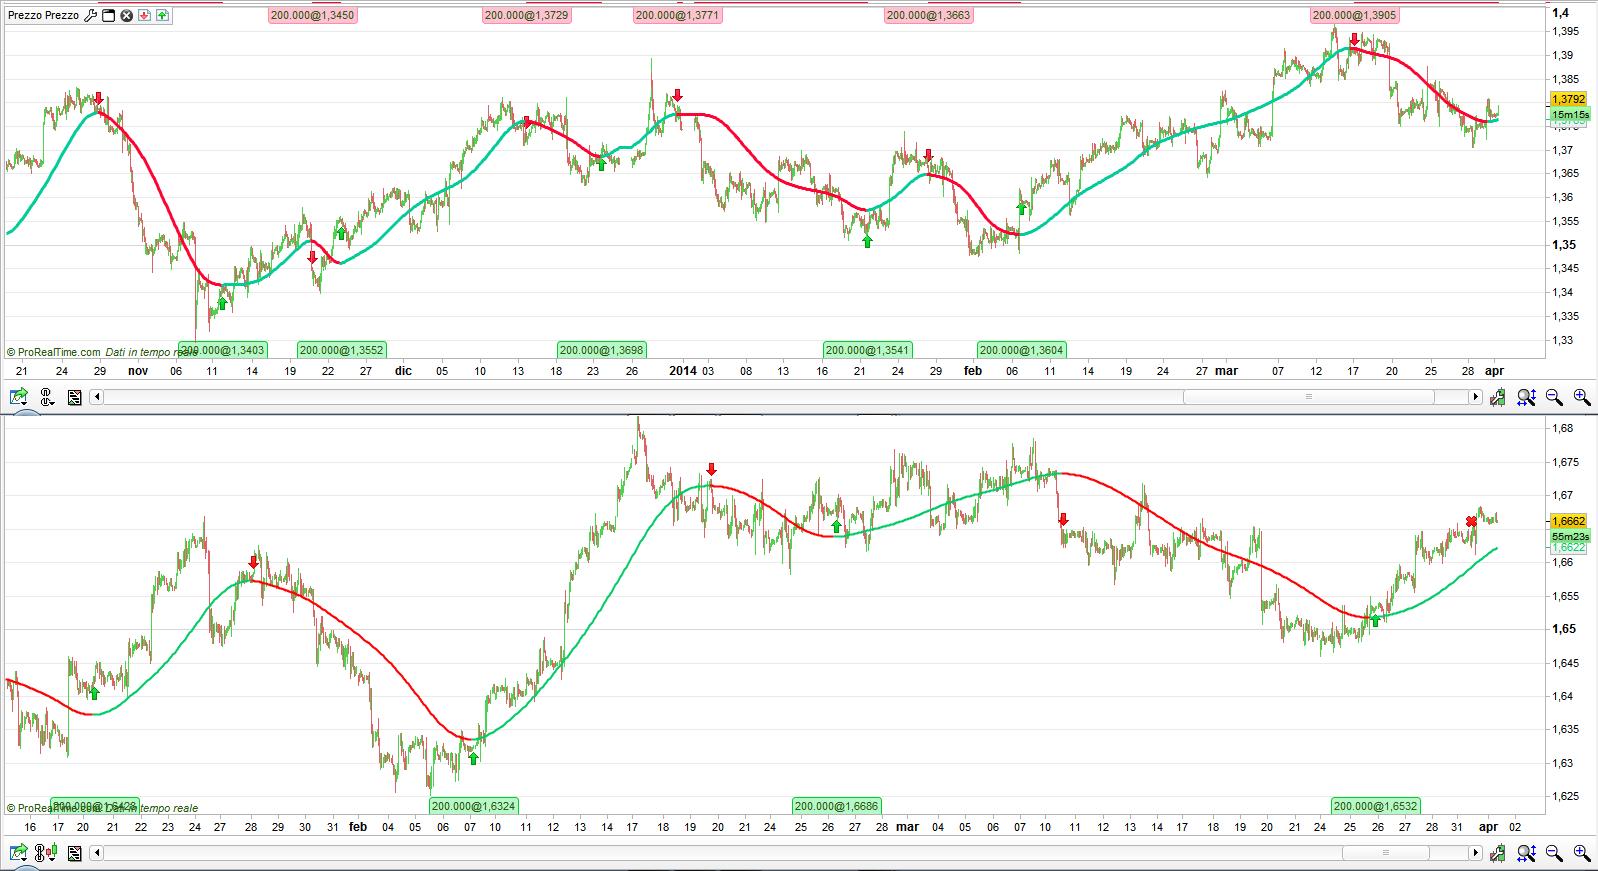 trading indicatore migliore